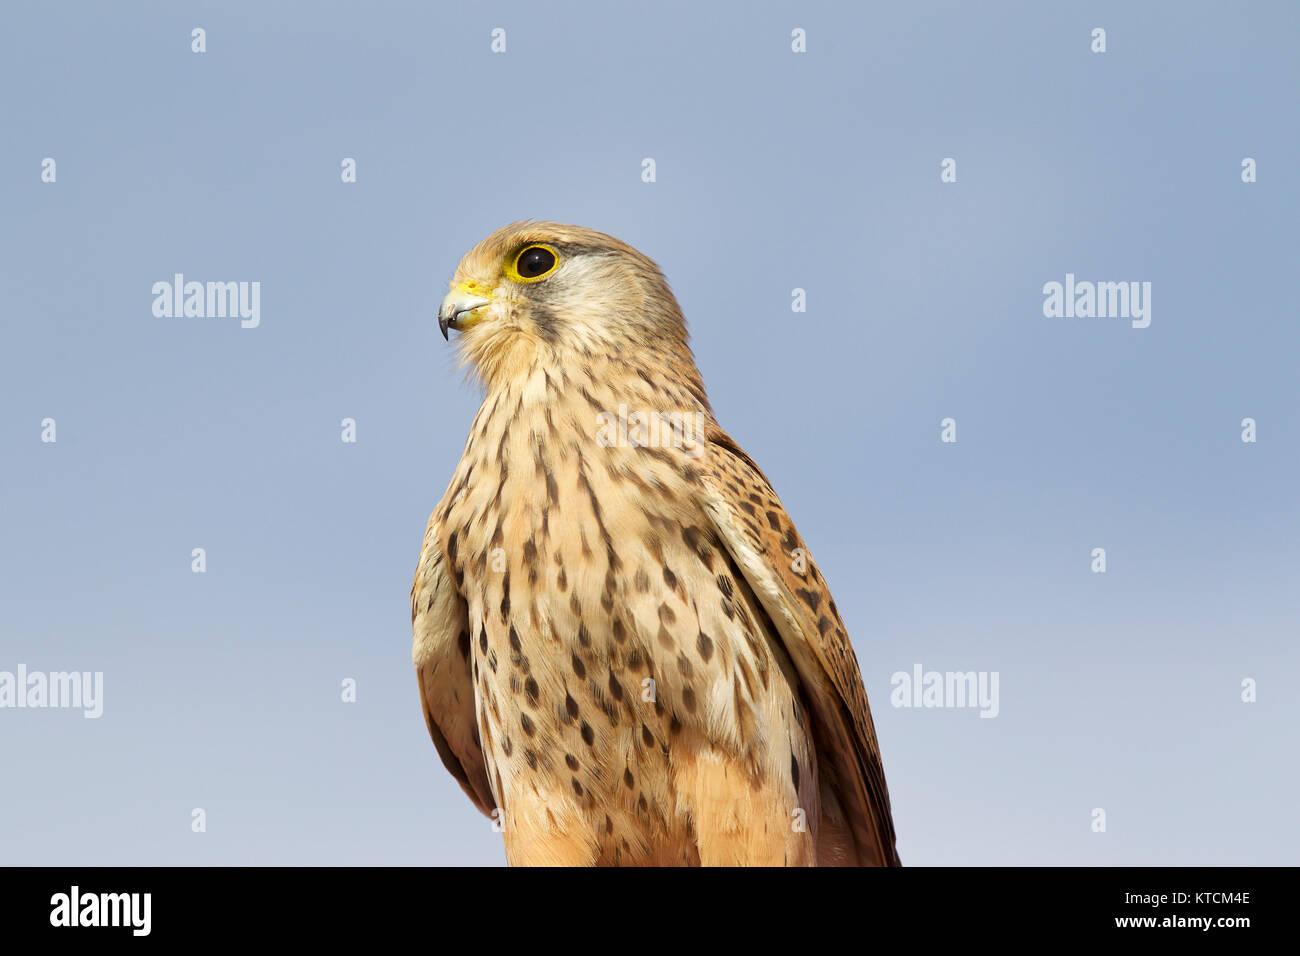 Proud bird of prey falcon family, Cyprus Stock Photo